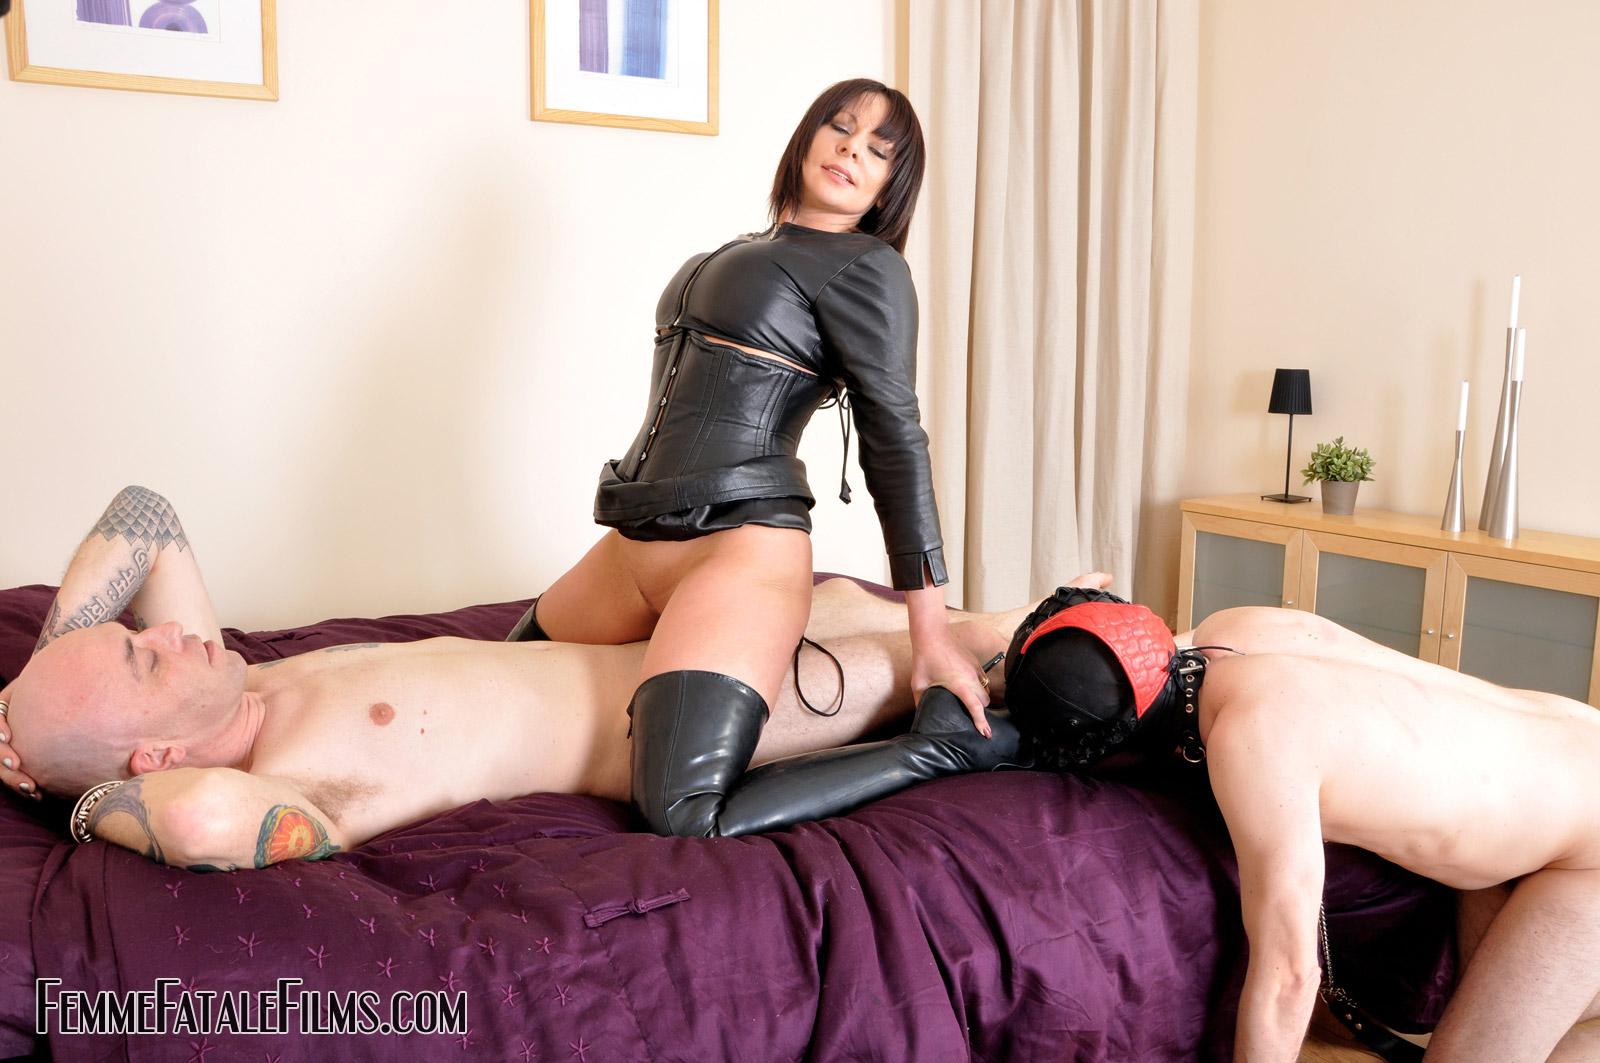 Lesbian Femdom And Brutal Bdsm In Xxx Scenes